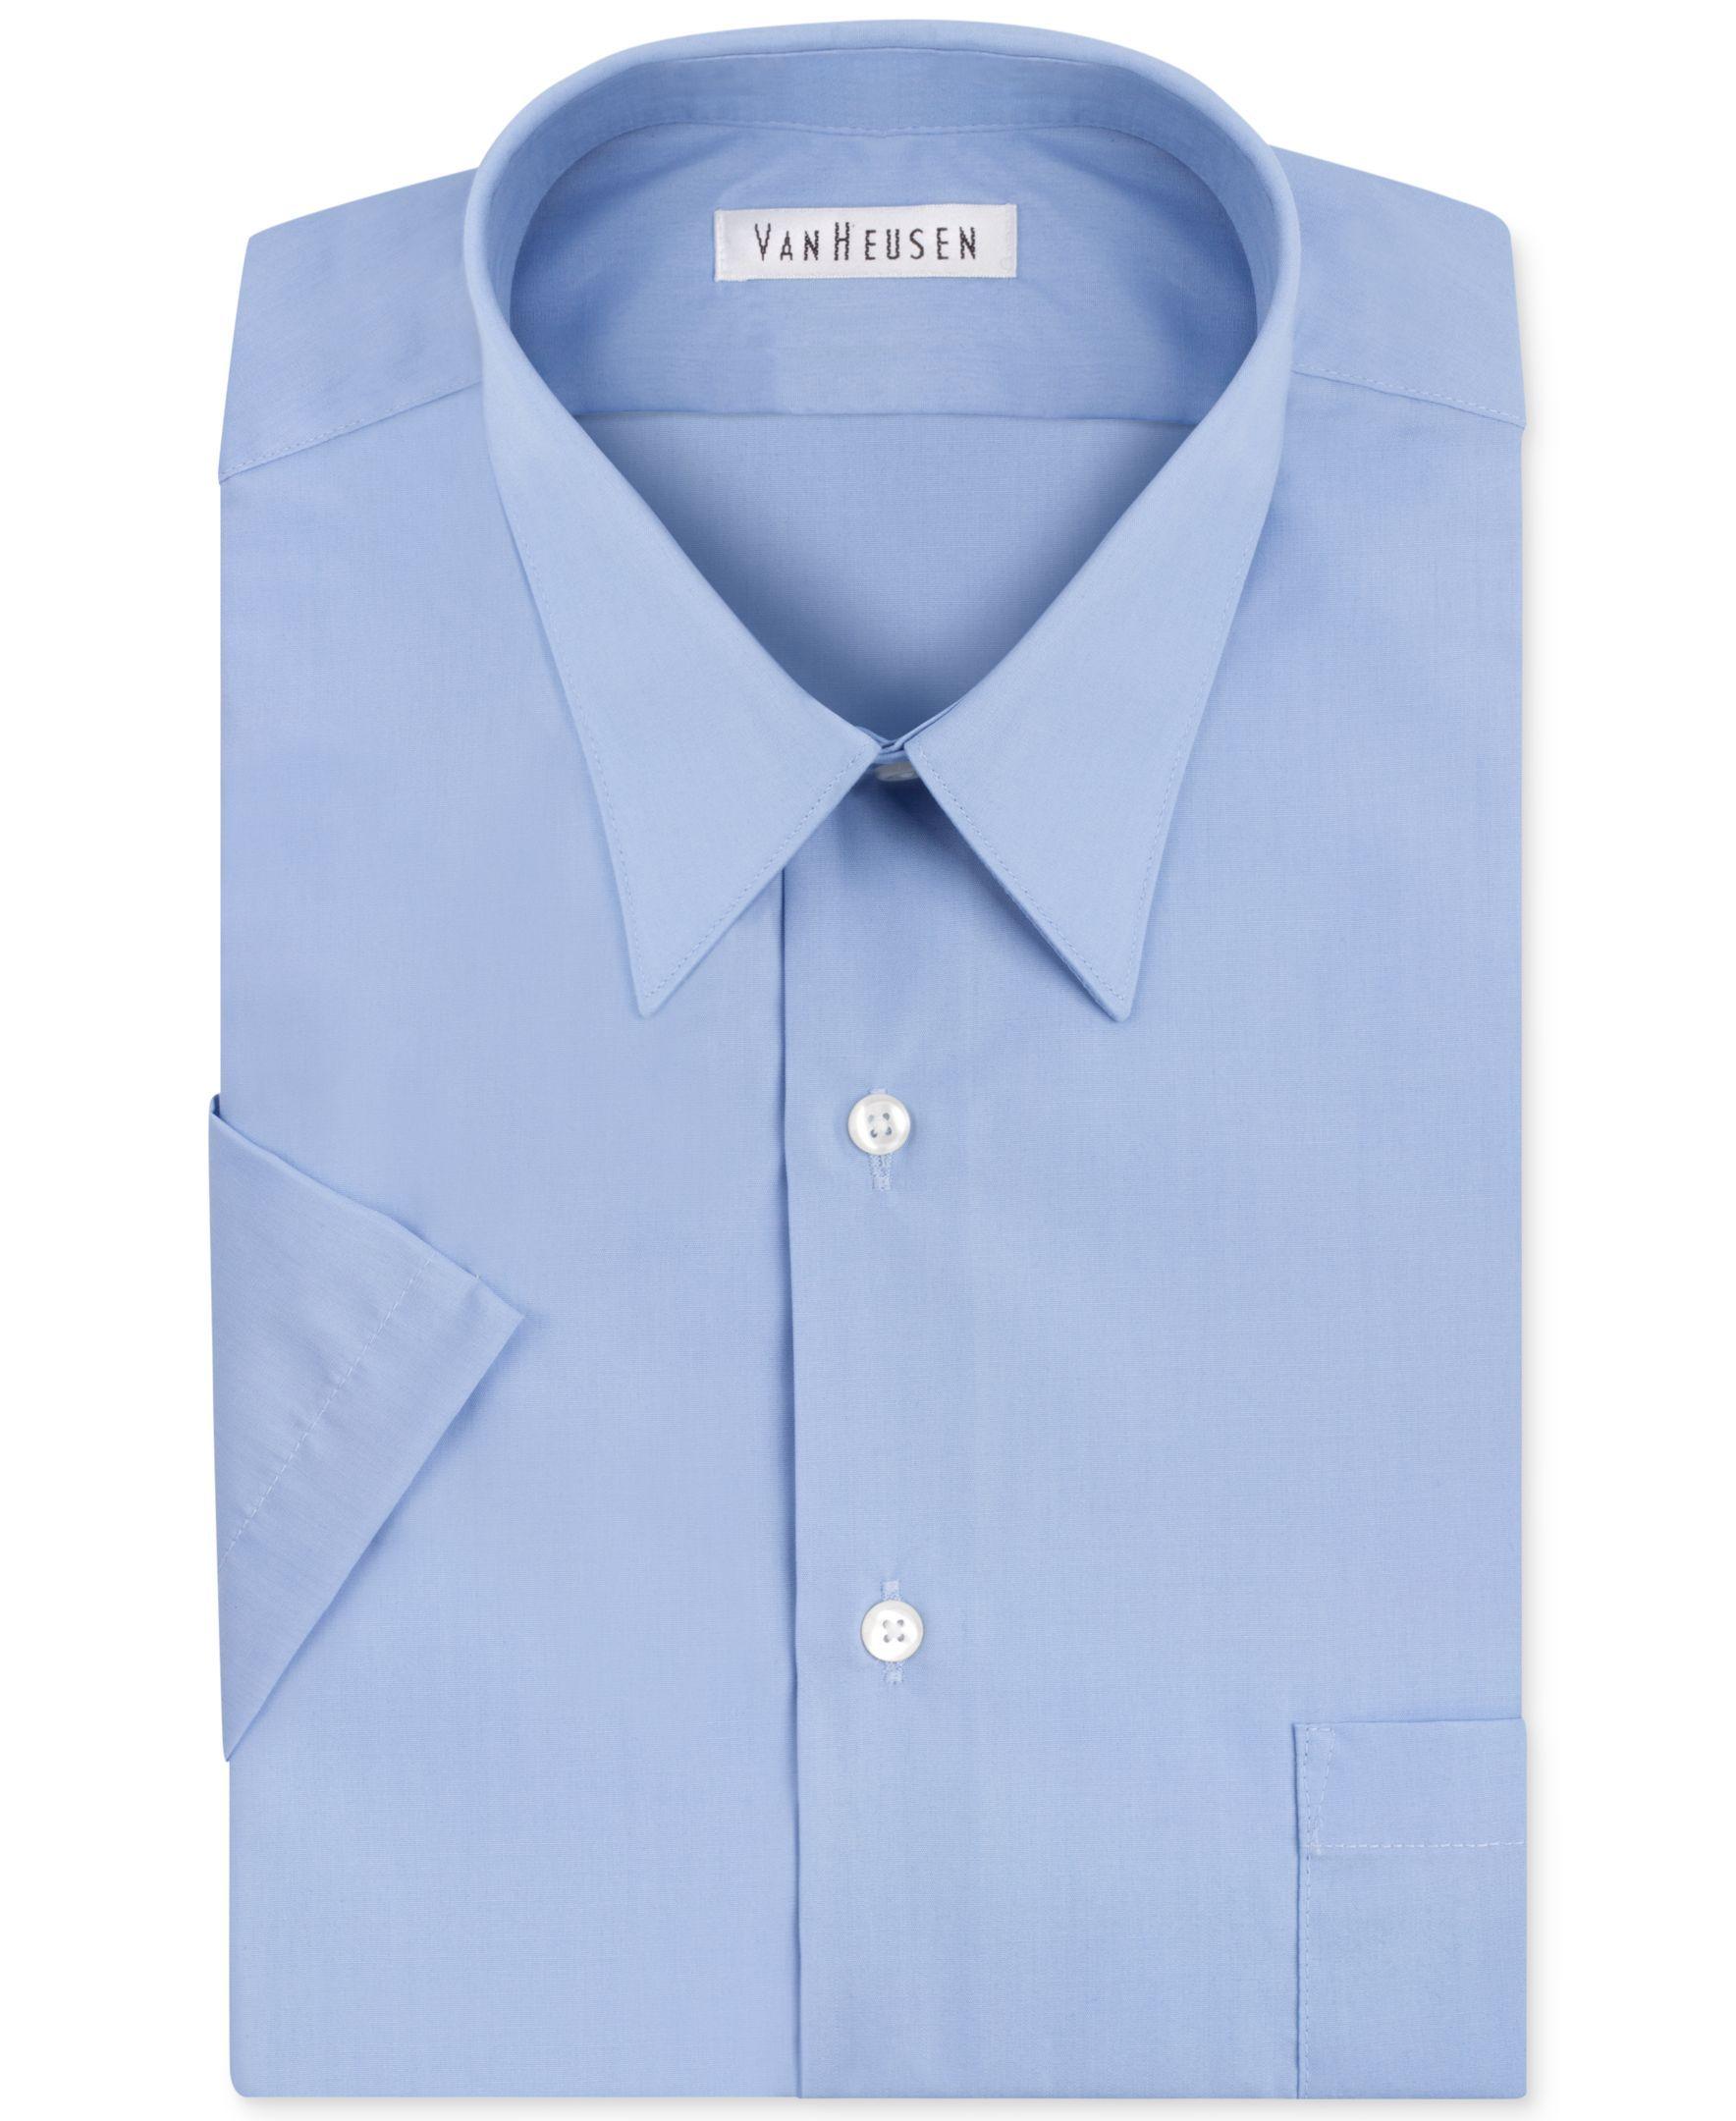 Van heusen poplin solid short sleeve dress shirt dress for Van heusen men s short sleeve dress shirts